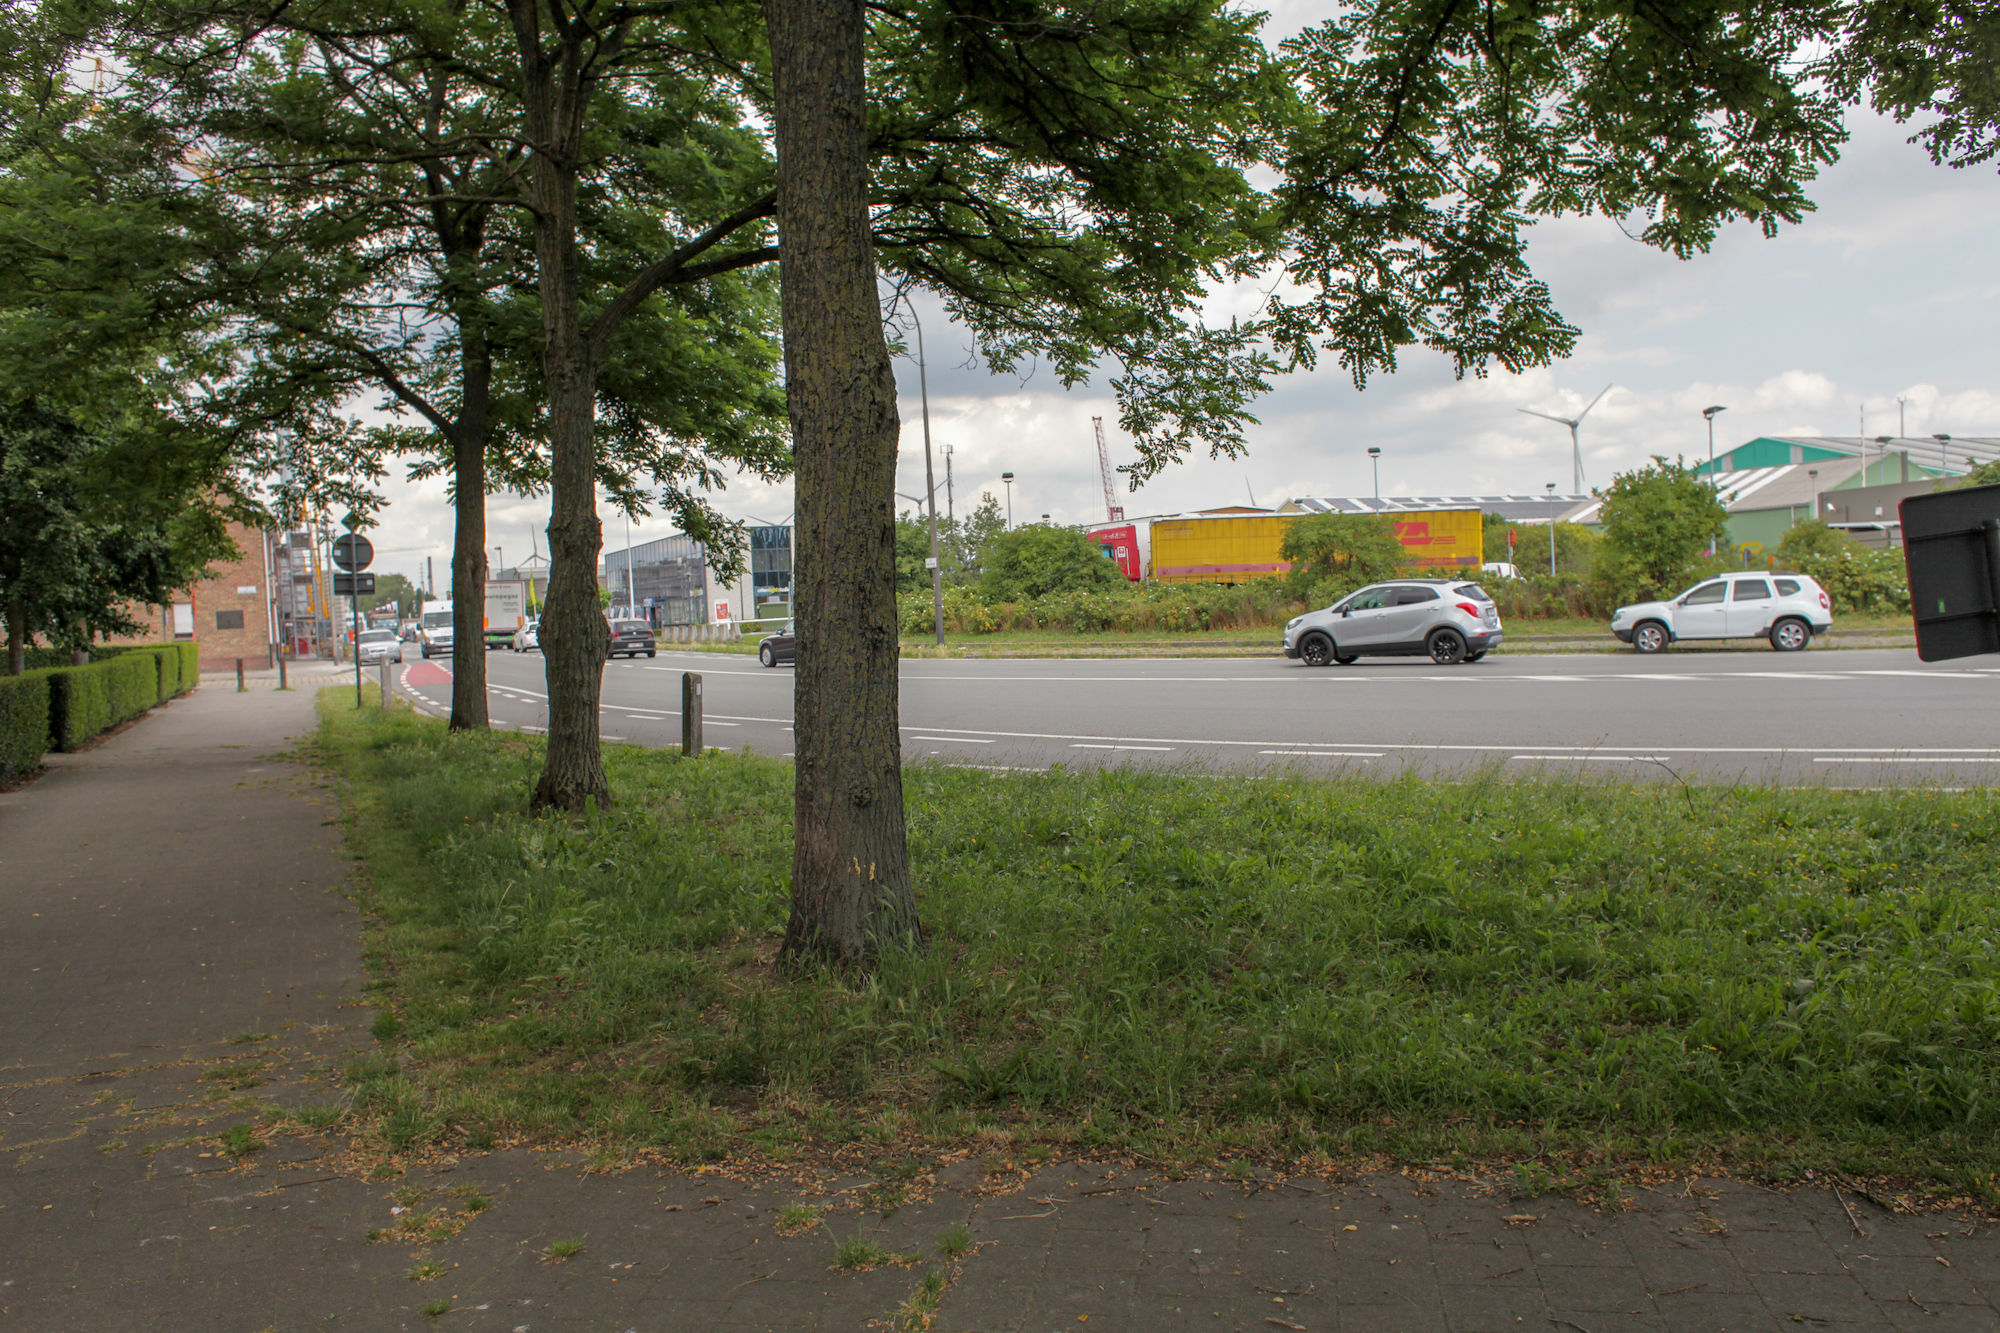 2019-07-02 Muide Meulestede prospectie Wannes_stadsvernieuwing_IMG_0316-2.jpg